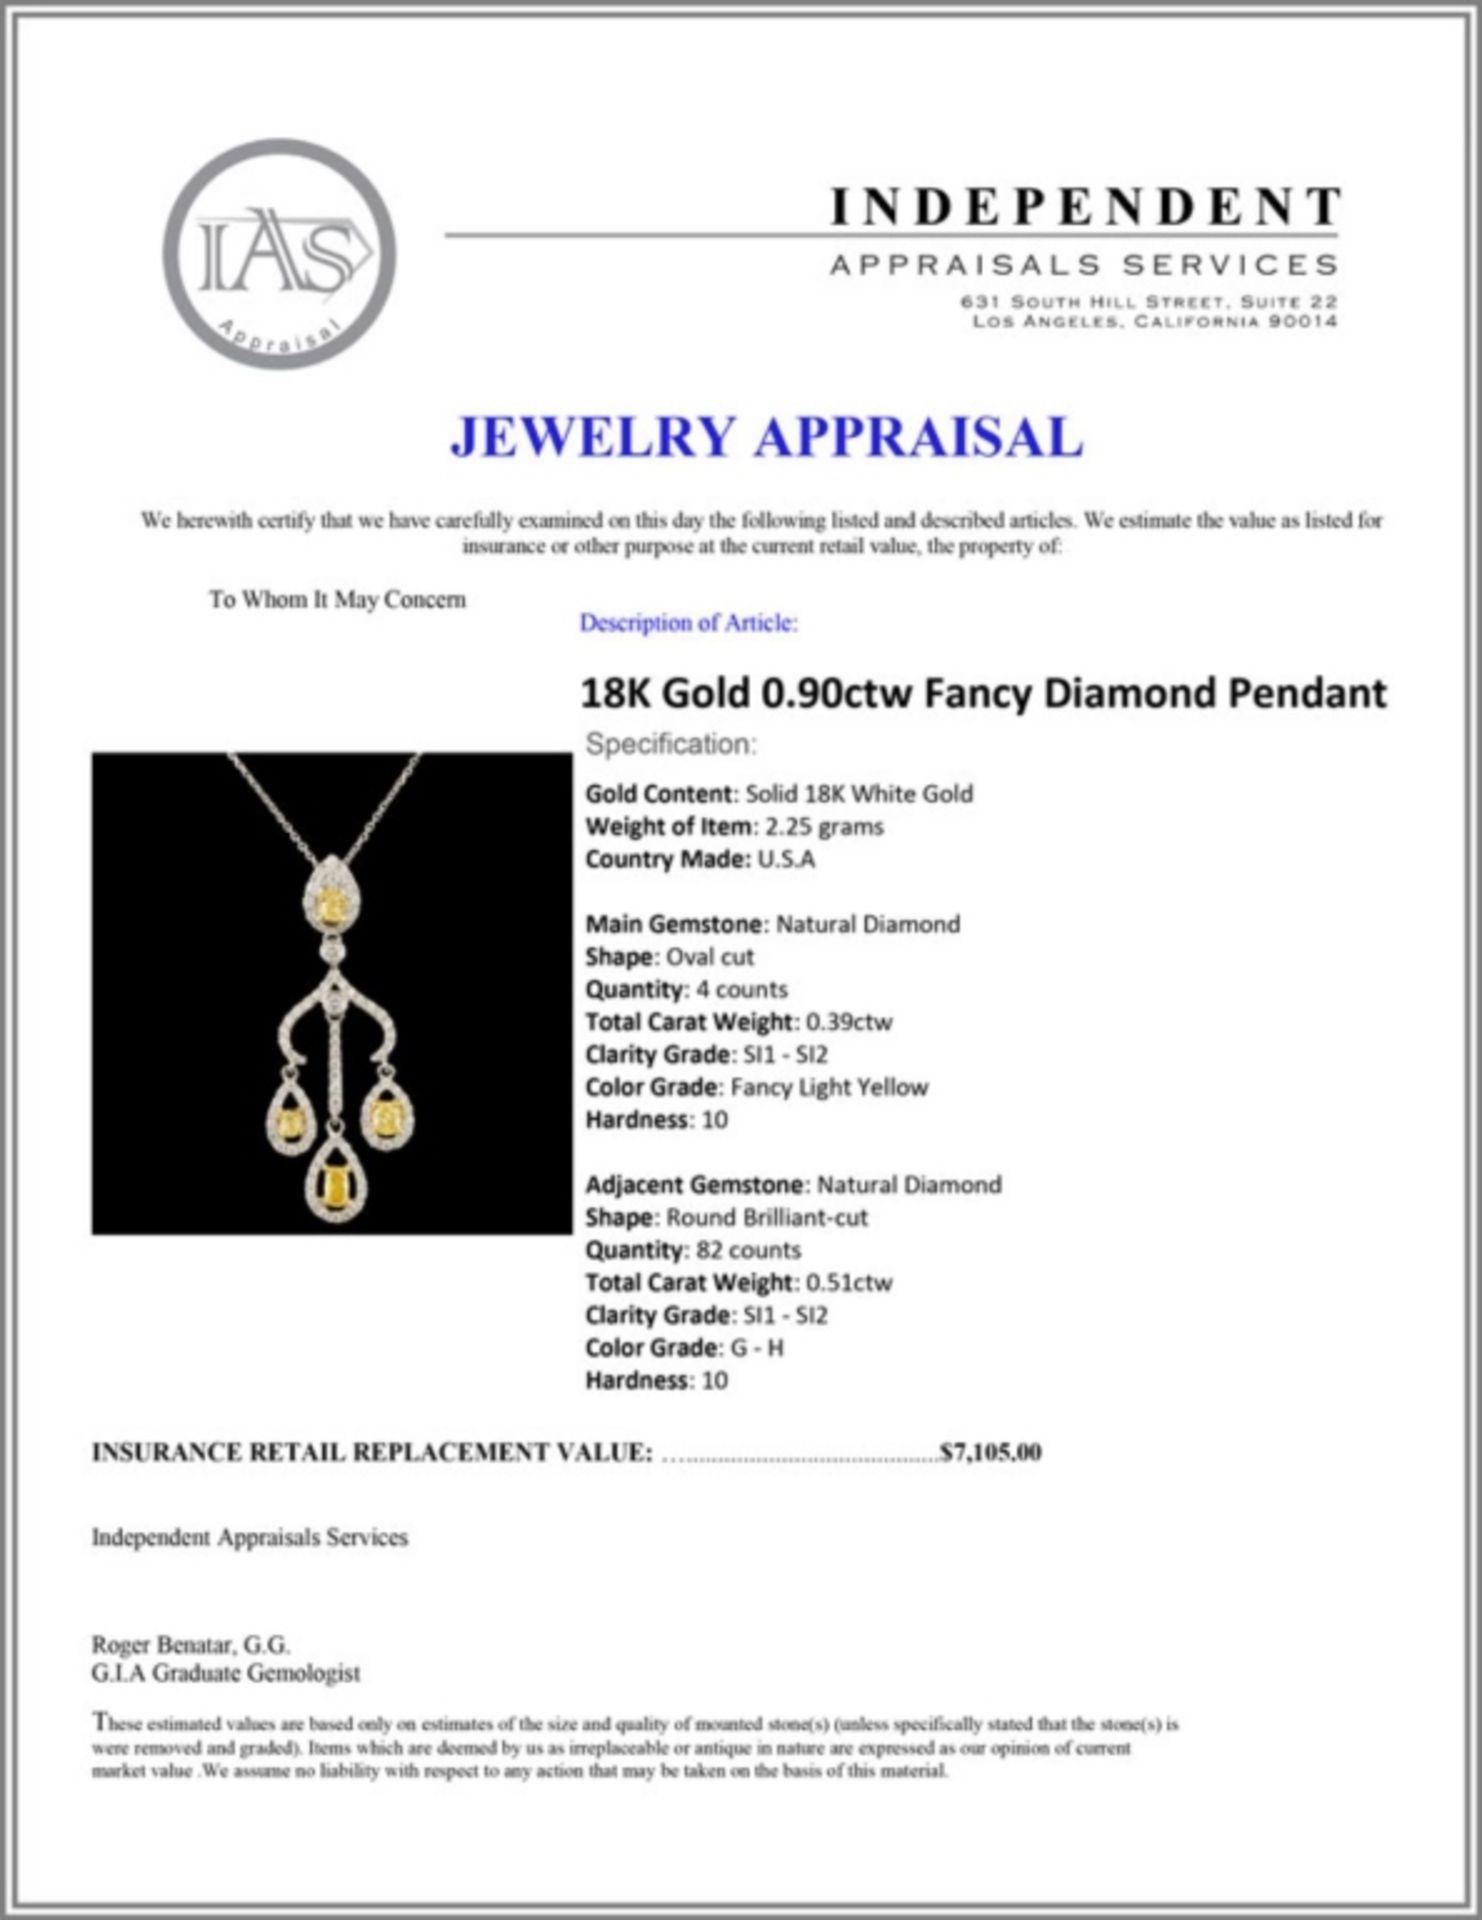 18K Gold 0.90ctw Fancy Diamond Pendant - Image 4 of 4